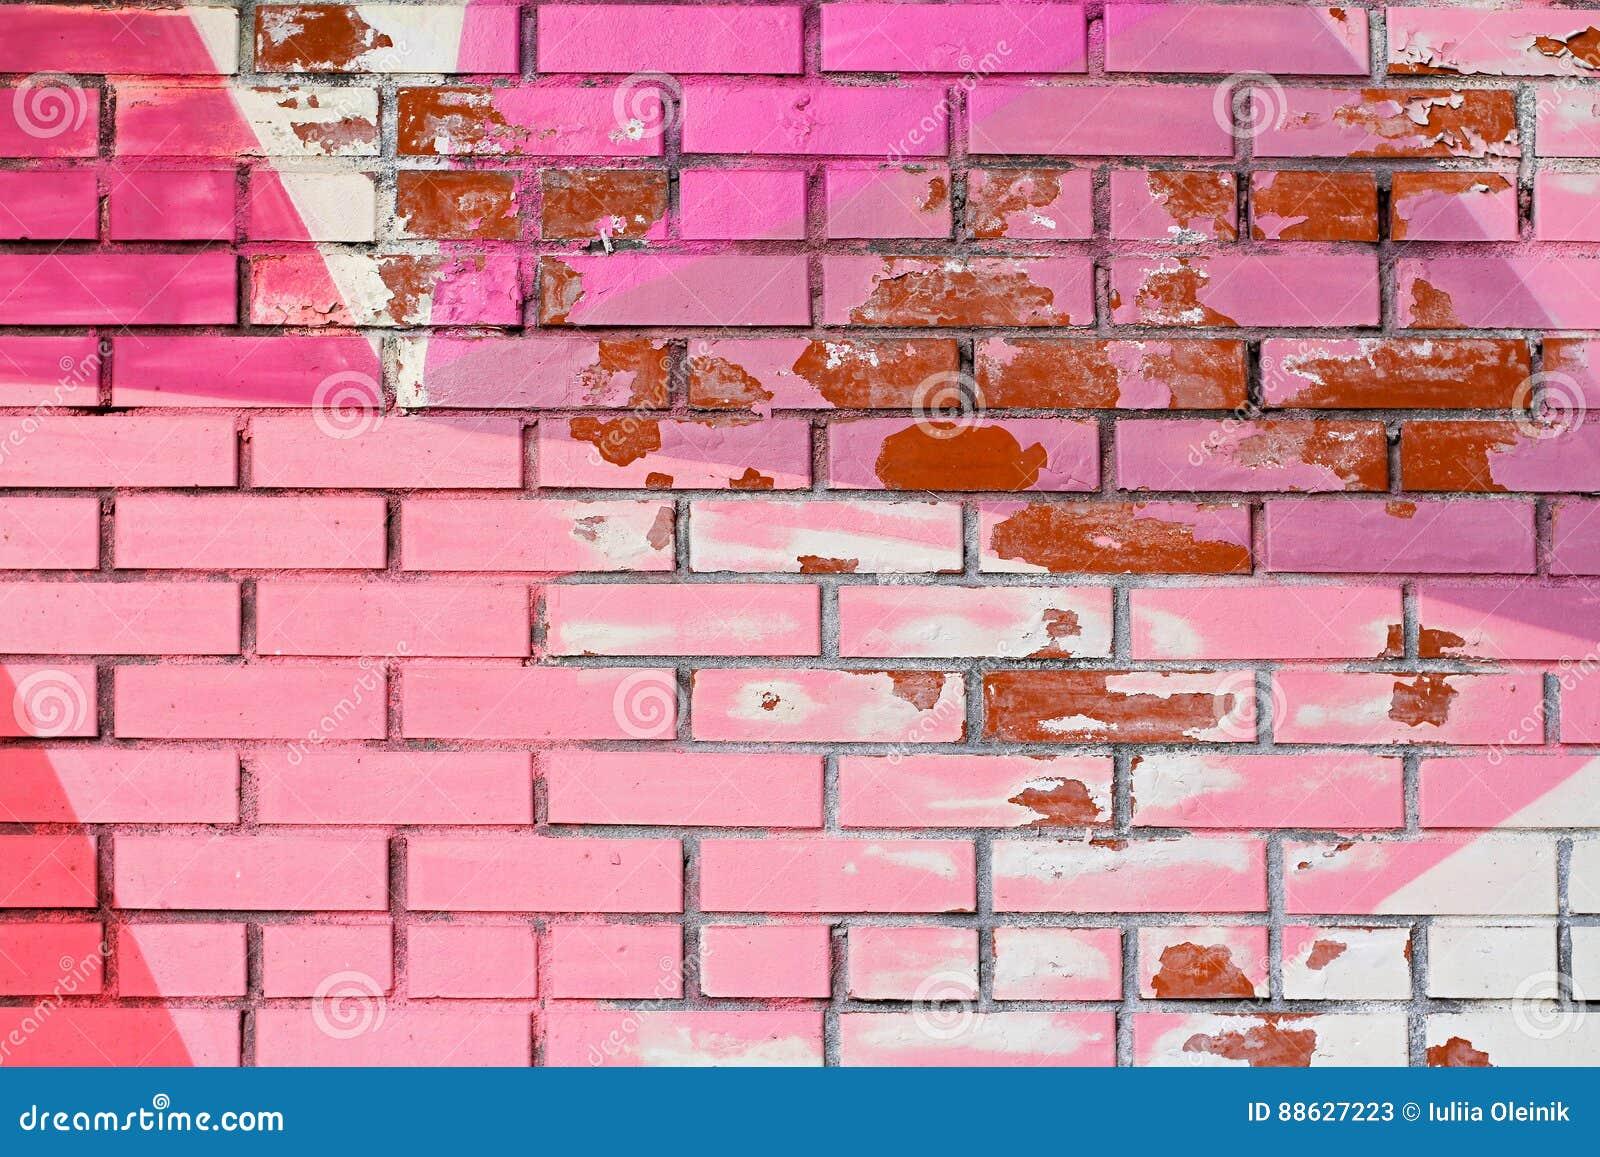 peeling plaster effect wallpaper